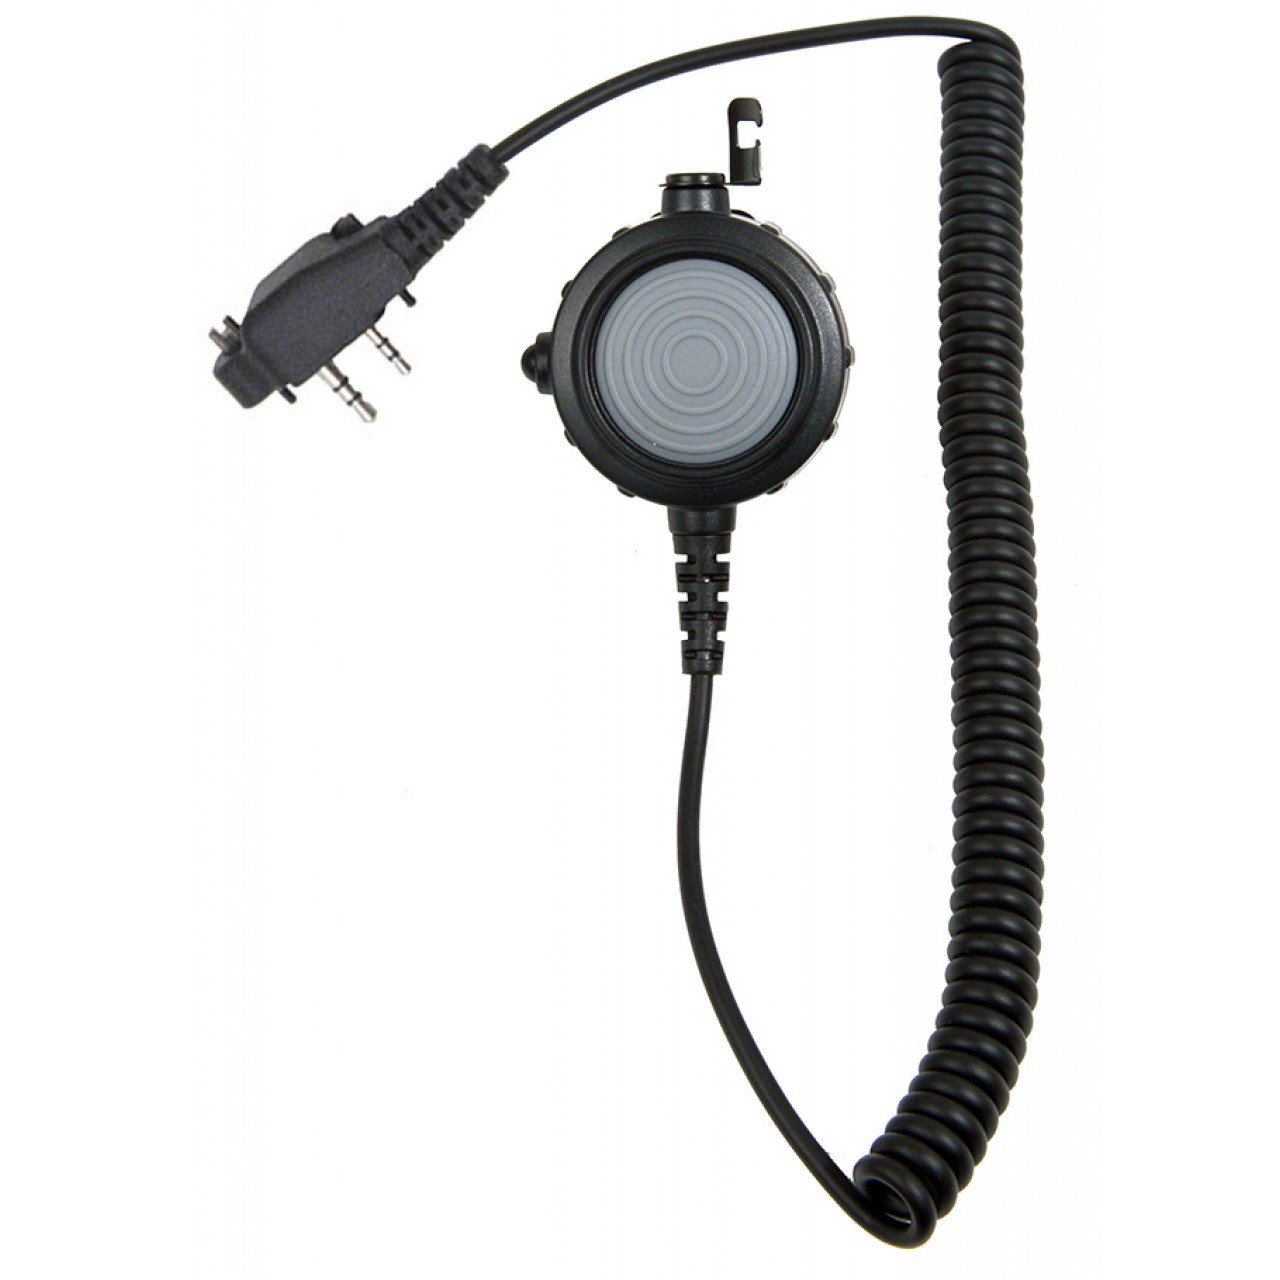 VS-SR29157 Adapters - ICOM